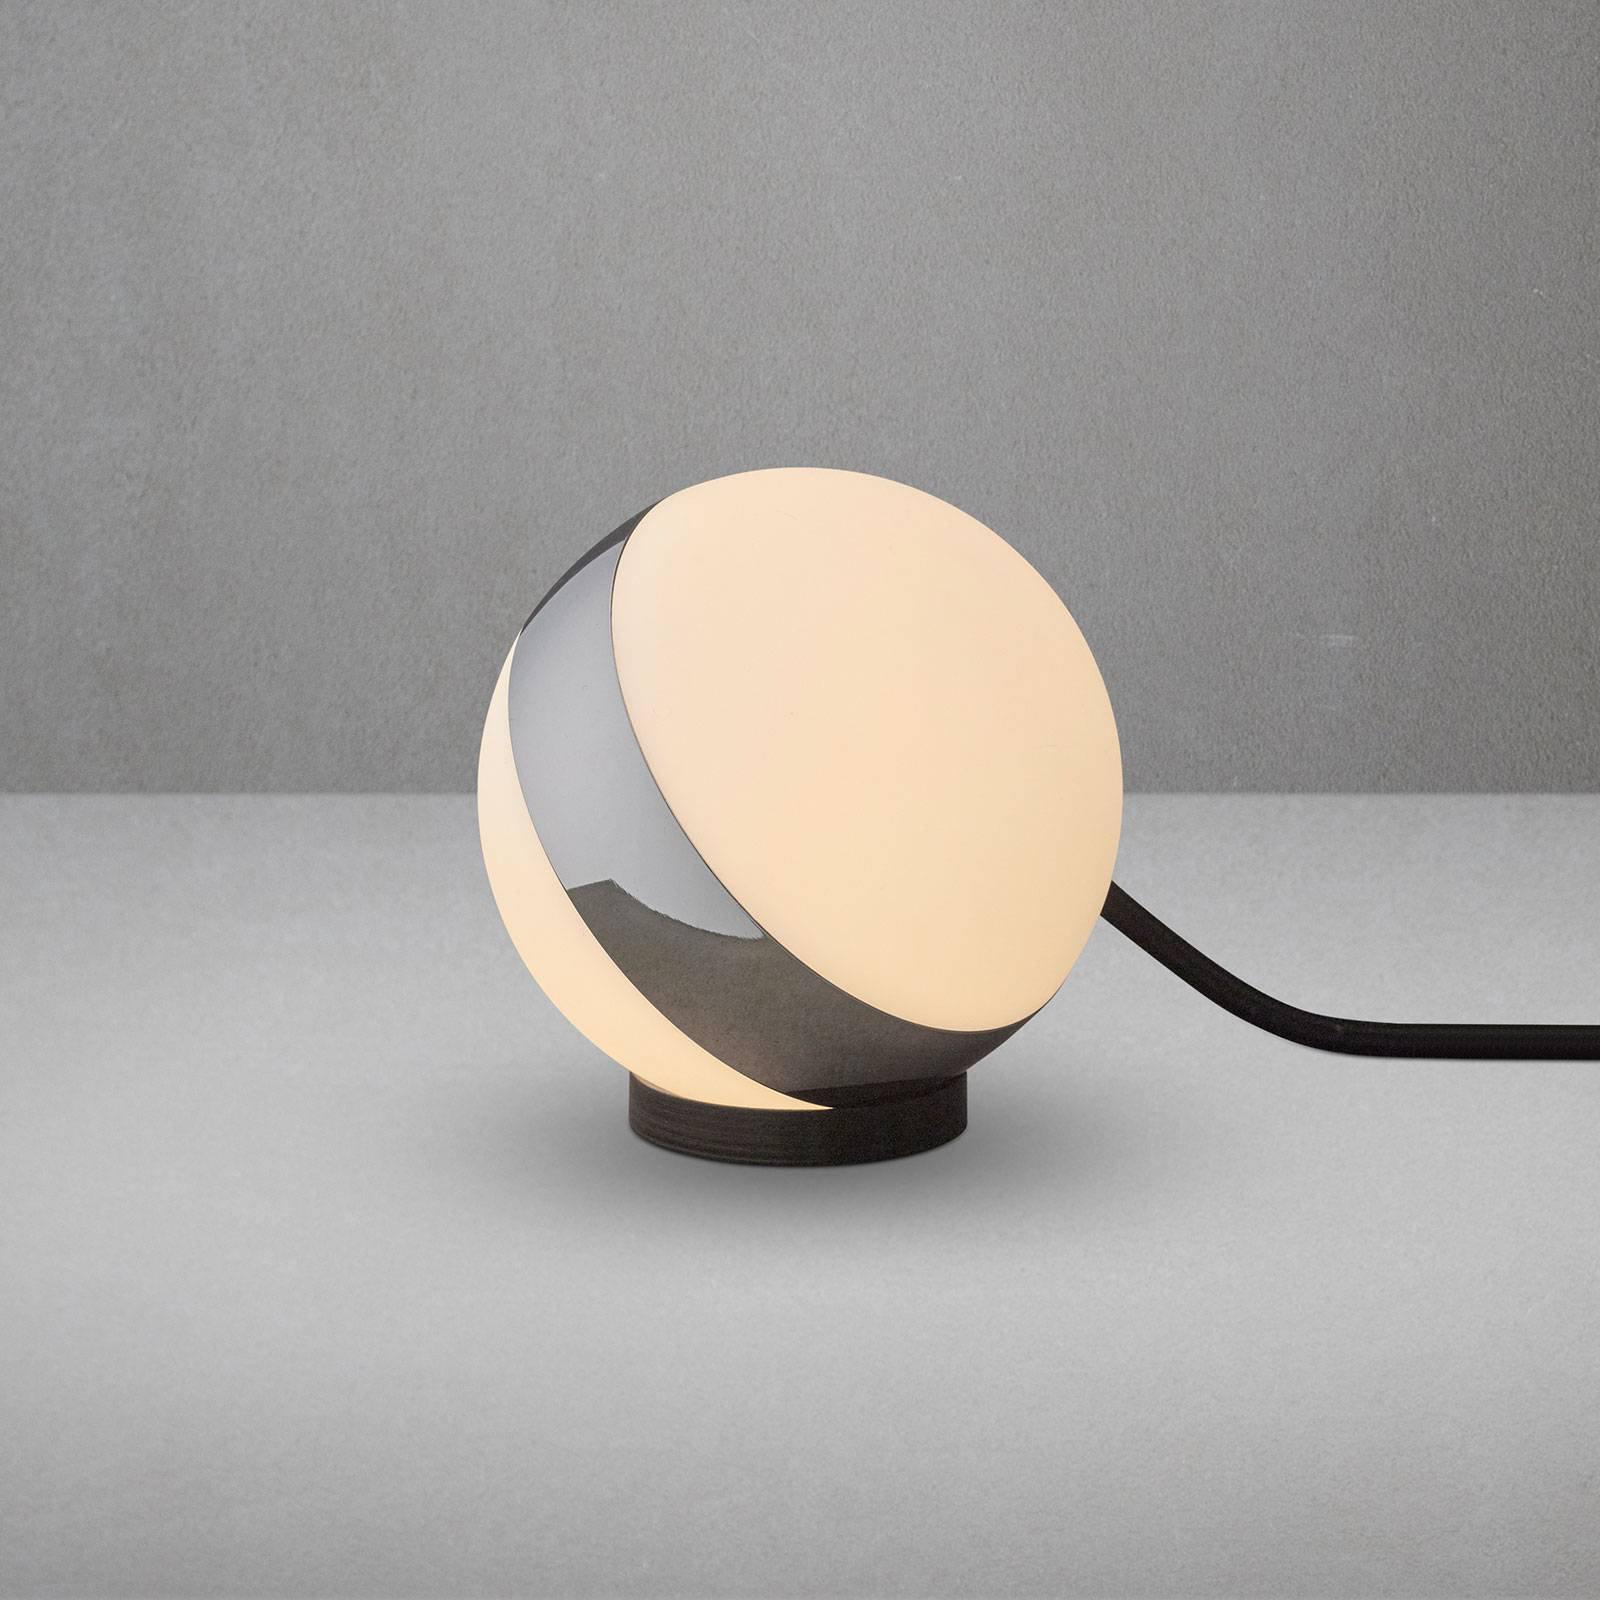 Bordlampe Circle i kuleform, høyde 12 cm